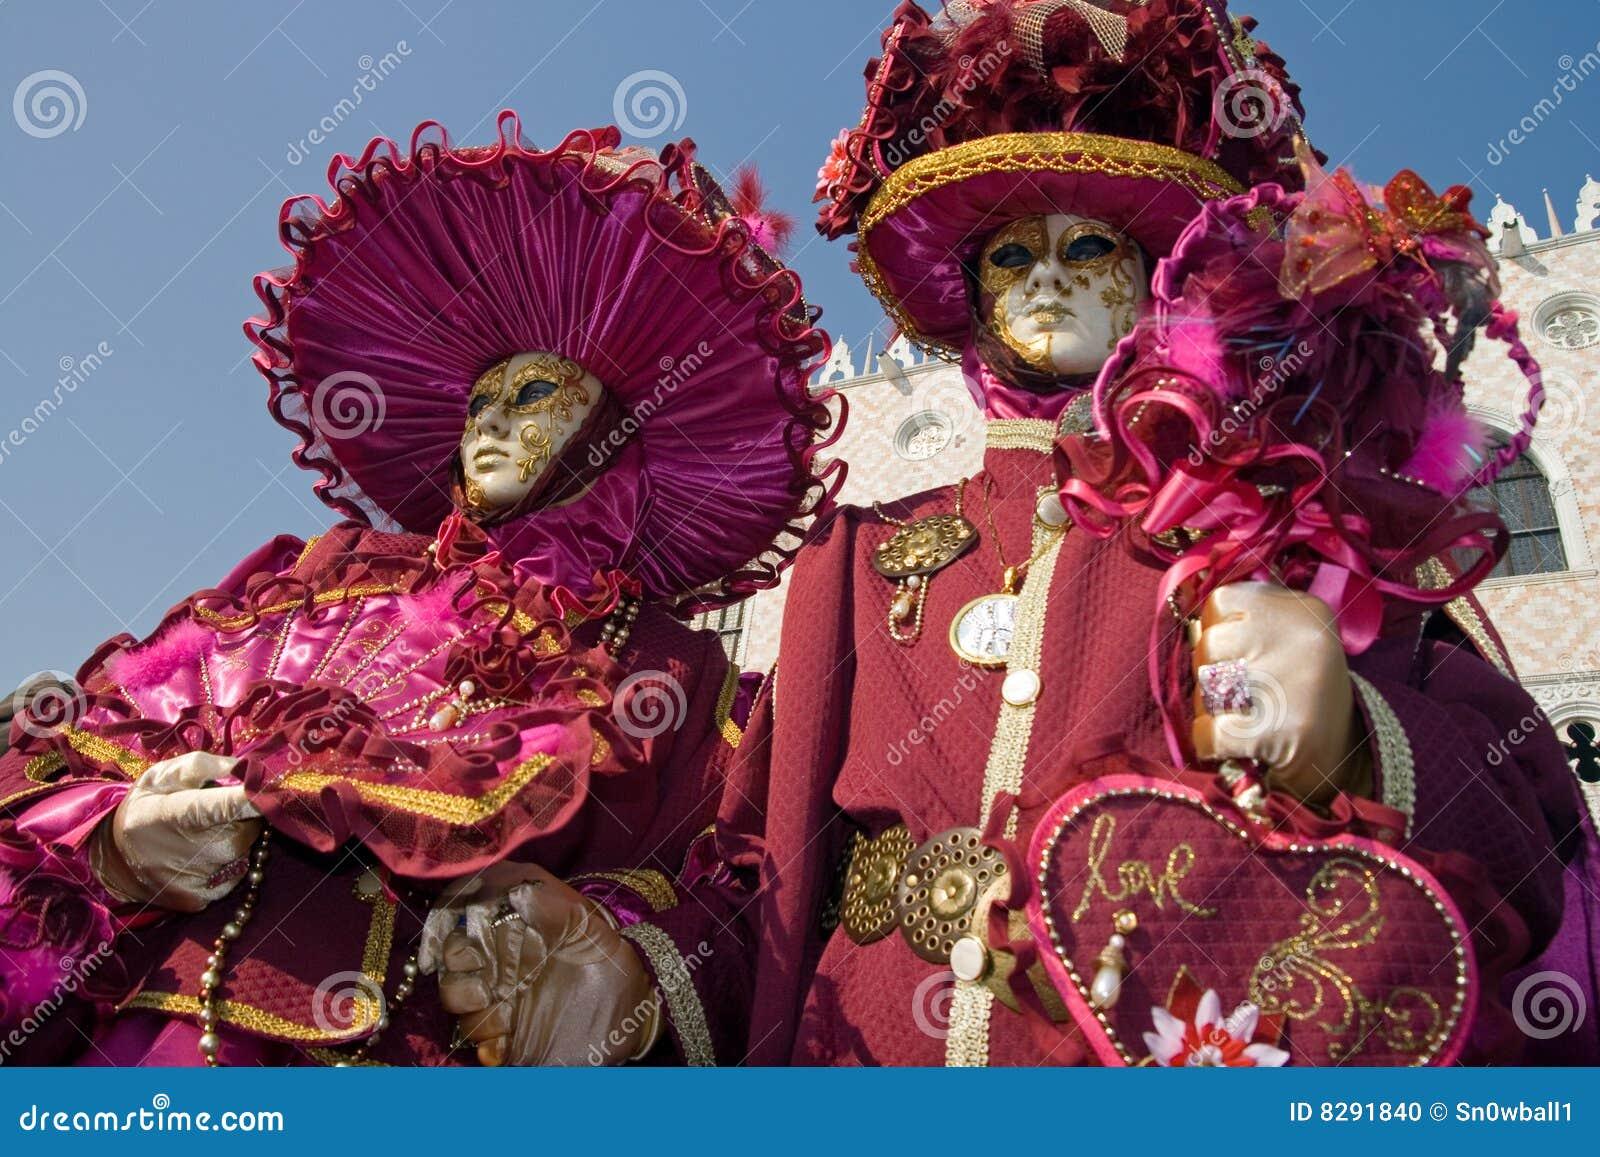 File:Carnaval 2009 (3312490388).jpg - Wikimedia Commons